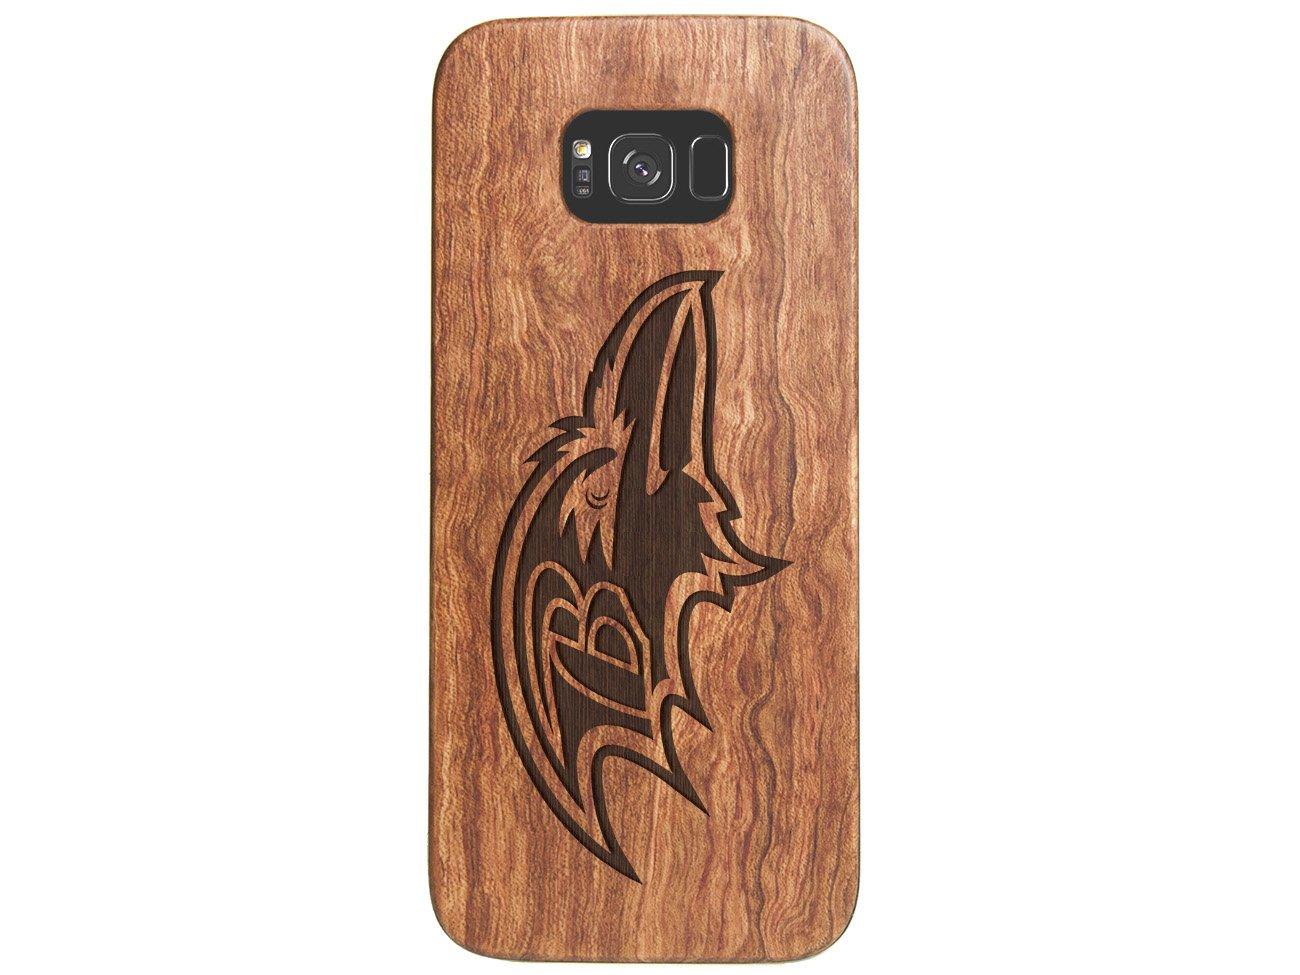 Baltimore Ravens Galaxy S8 Case